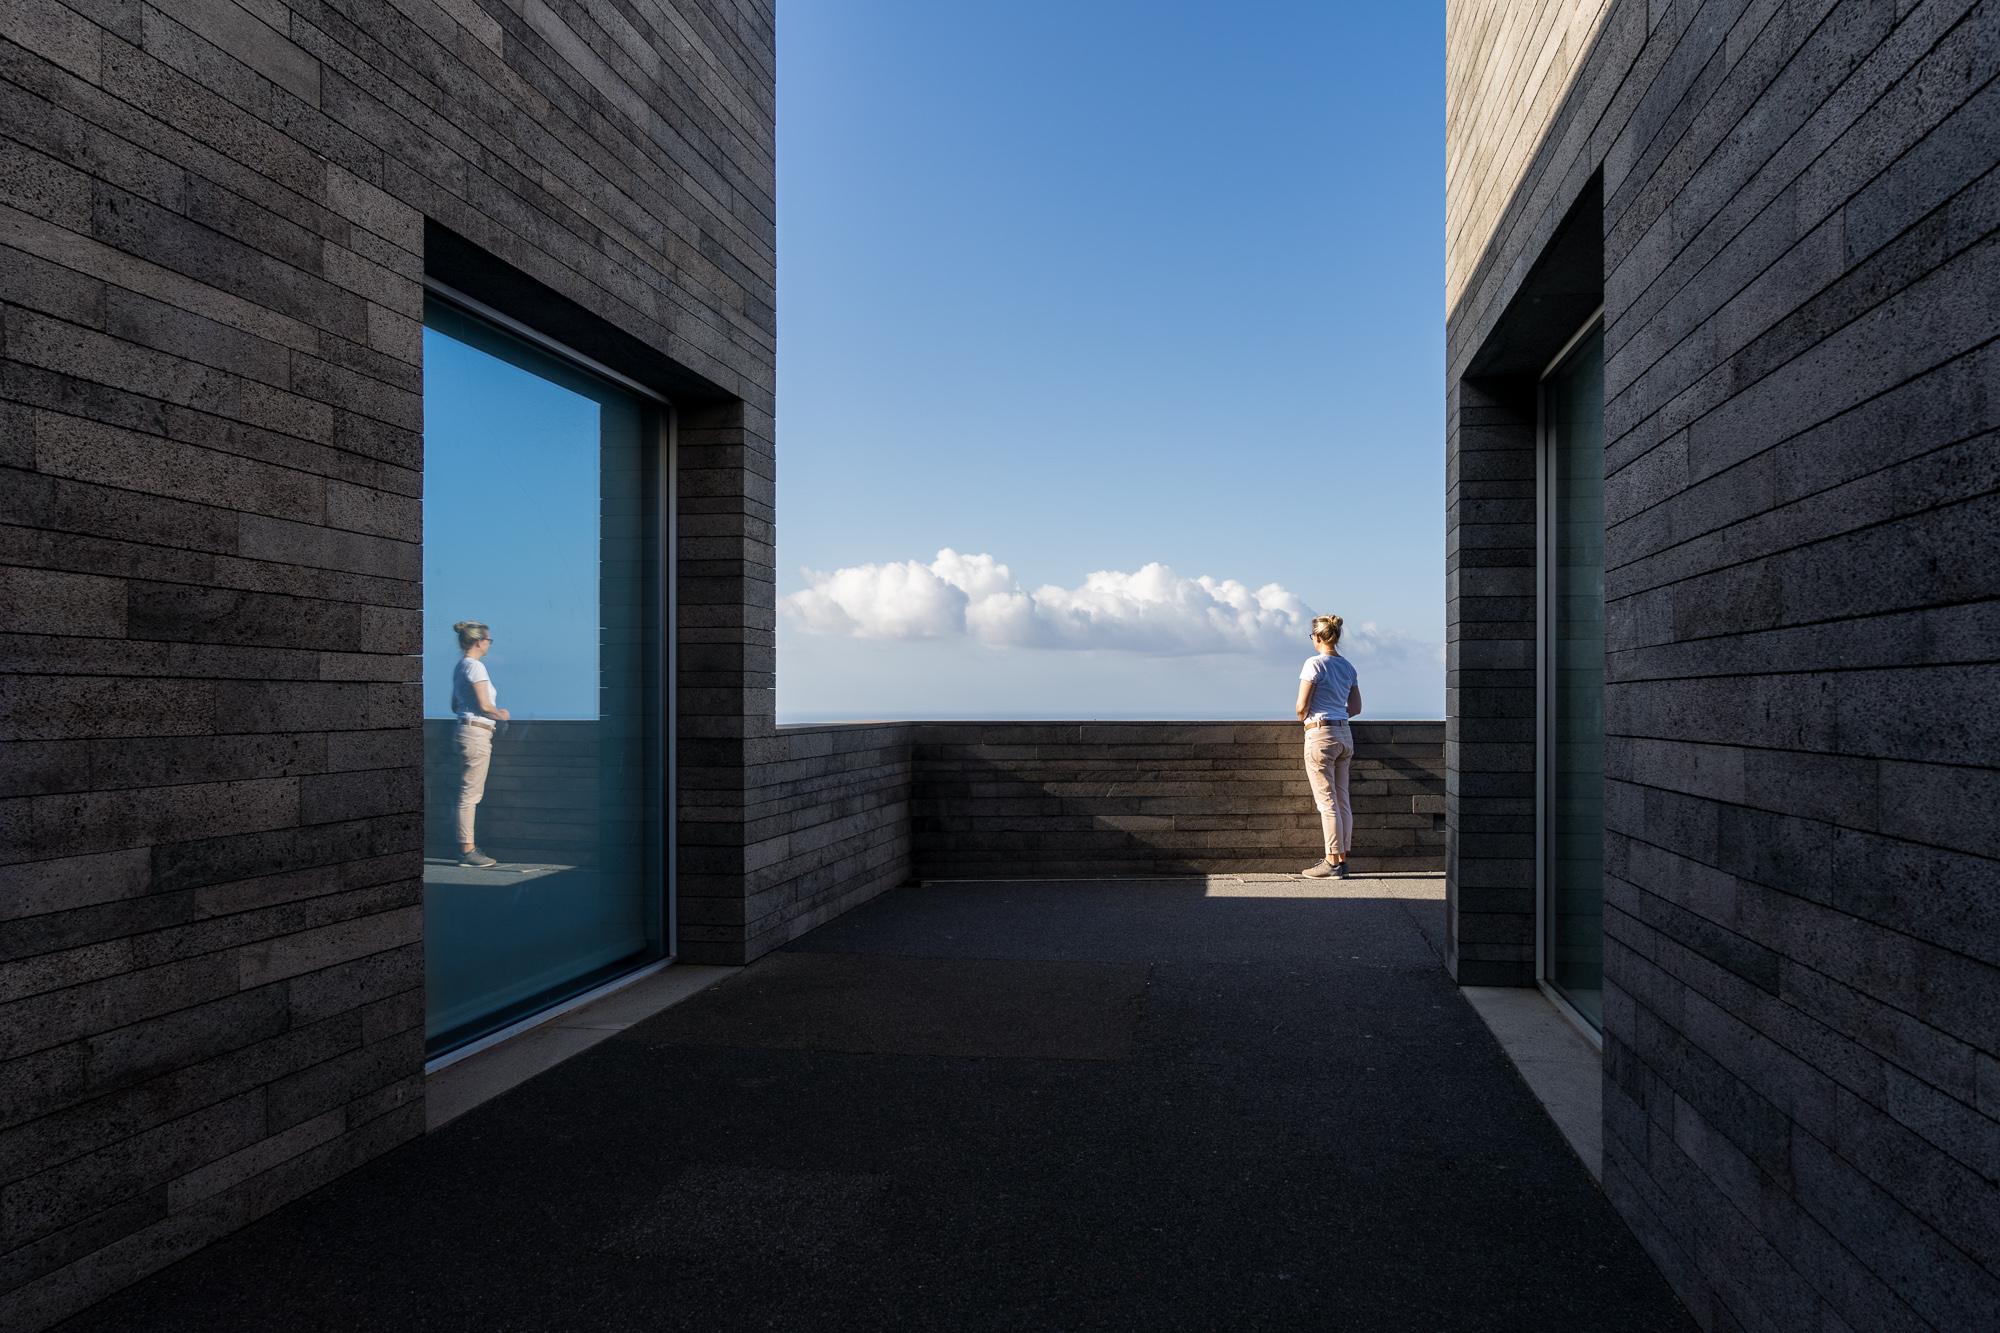 querformat-fotografie - Achim Katzberg - MUDAS - [MUDAS - Madeira / August 2018]